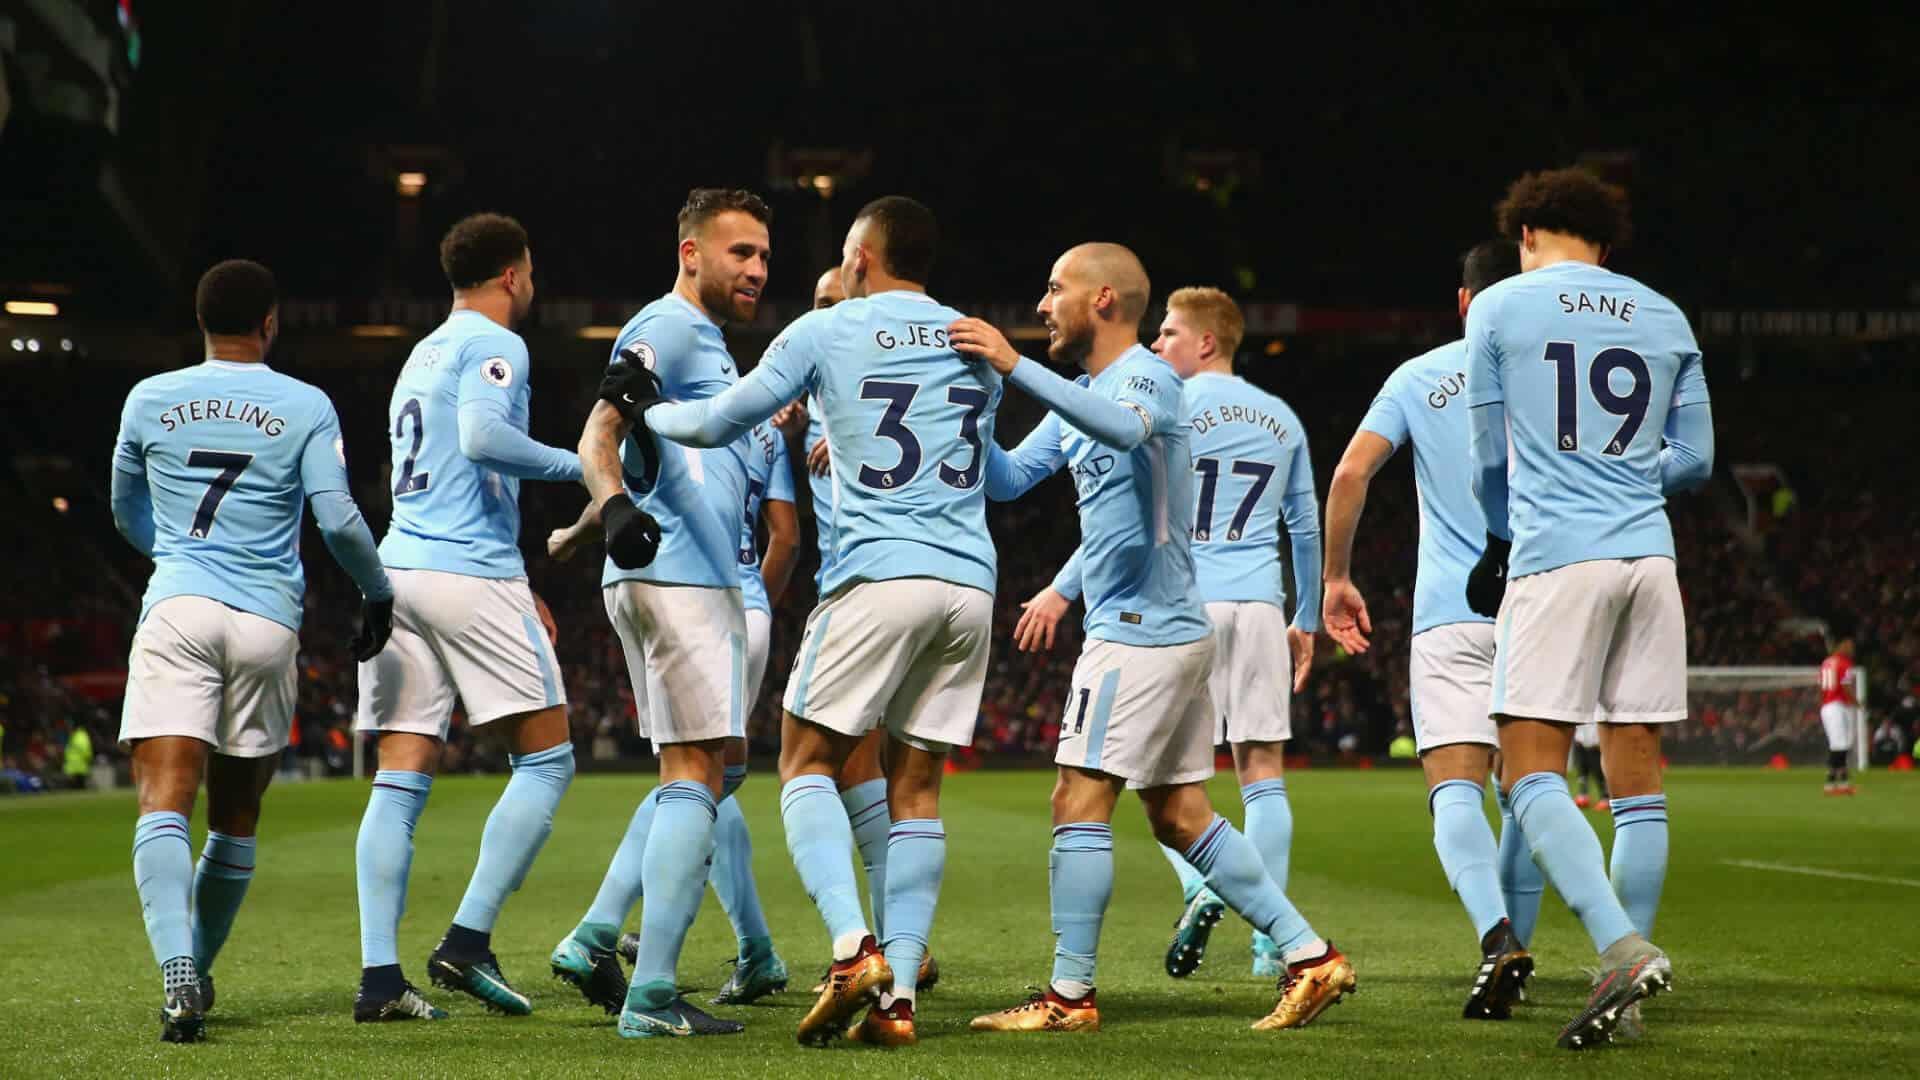 MANCHESTER CITY Team Football 2018